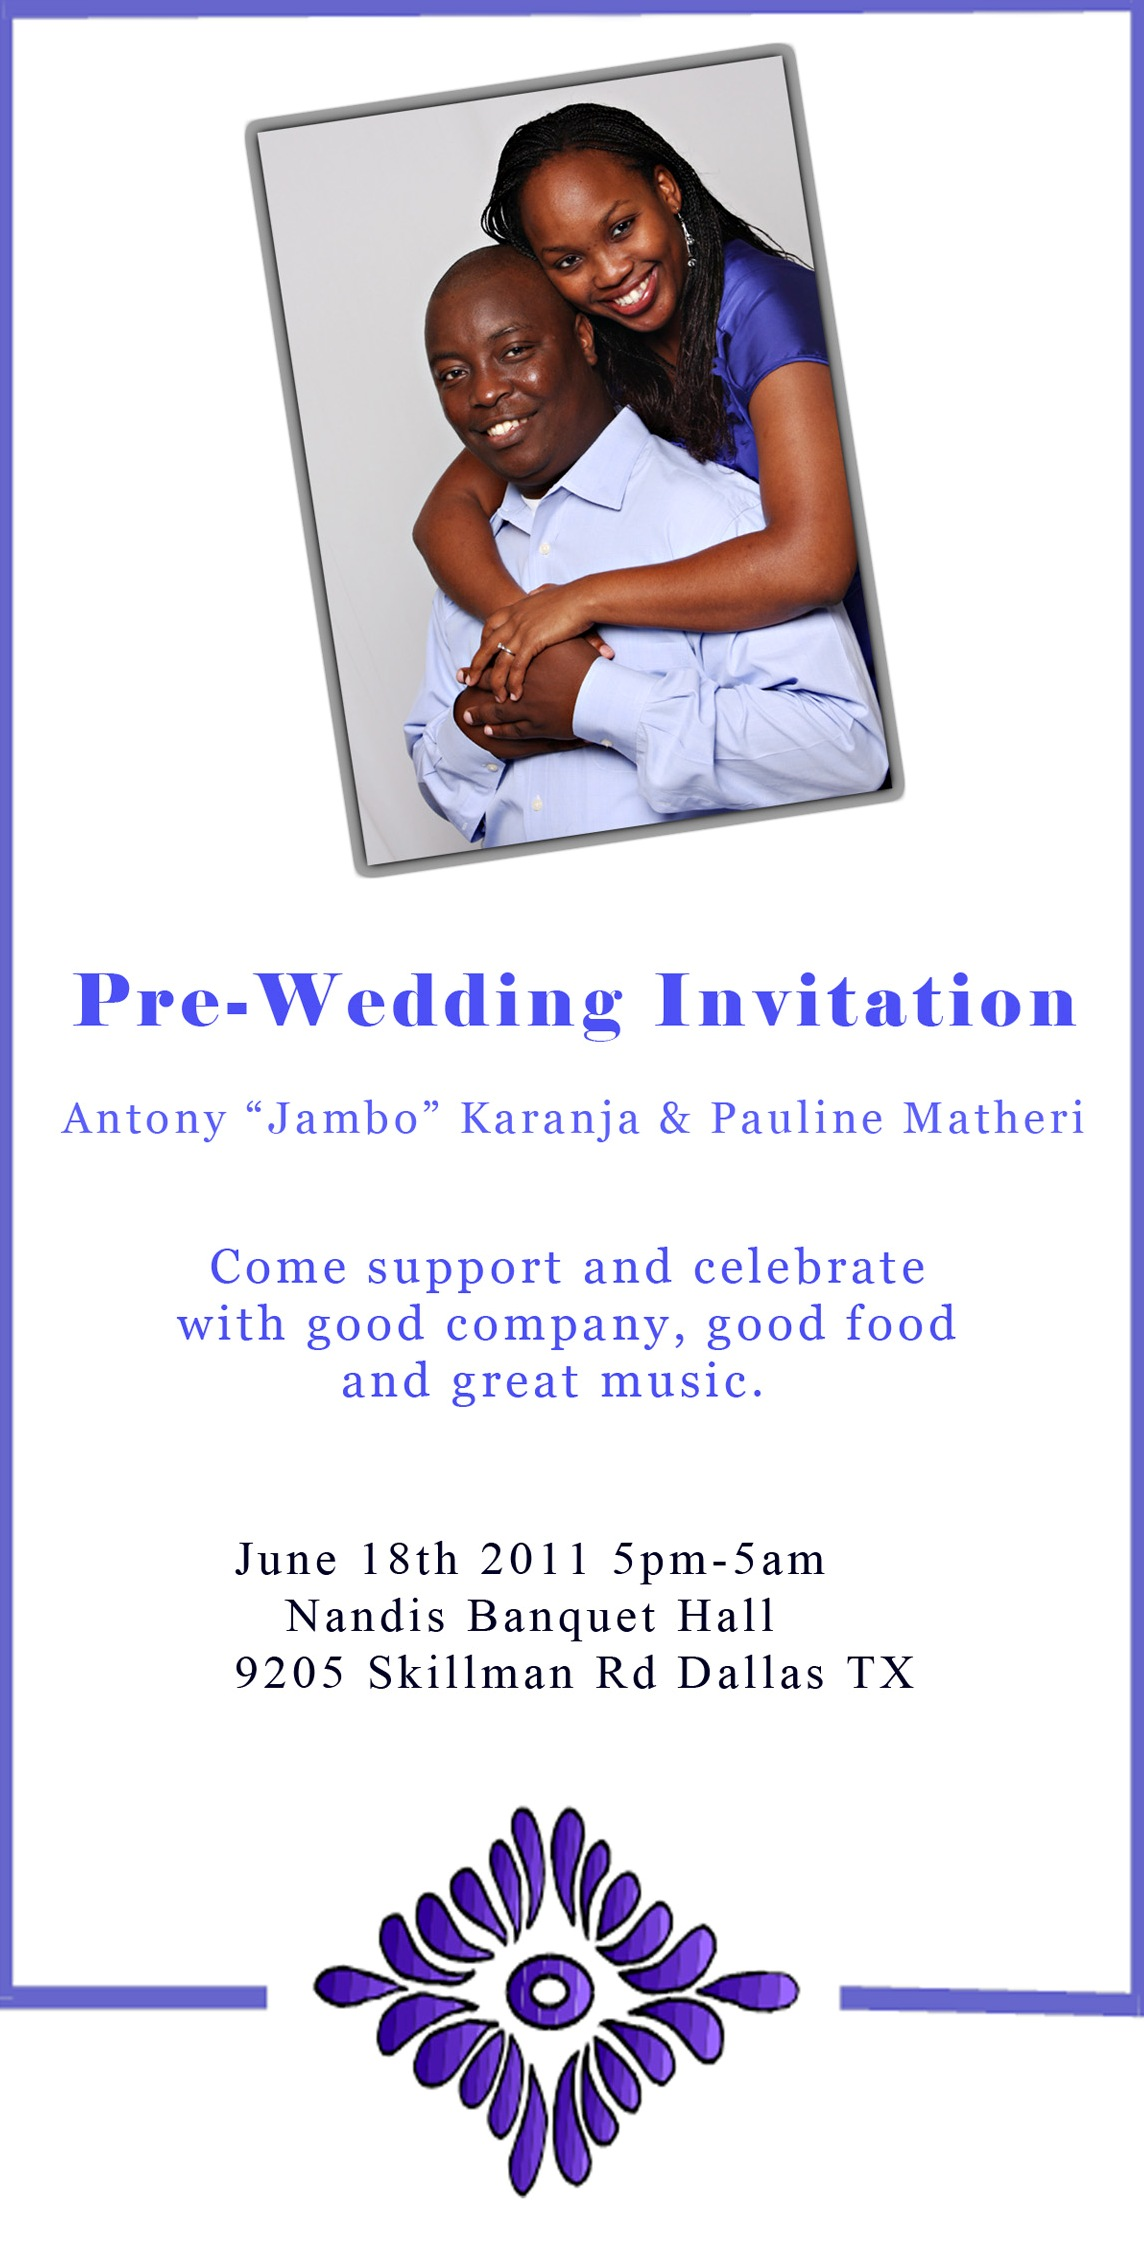 Invitation From The Wedding Committee Of Antony Jambo Karanja